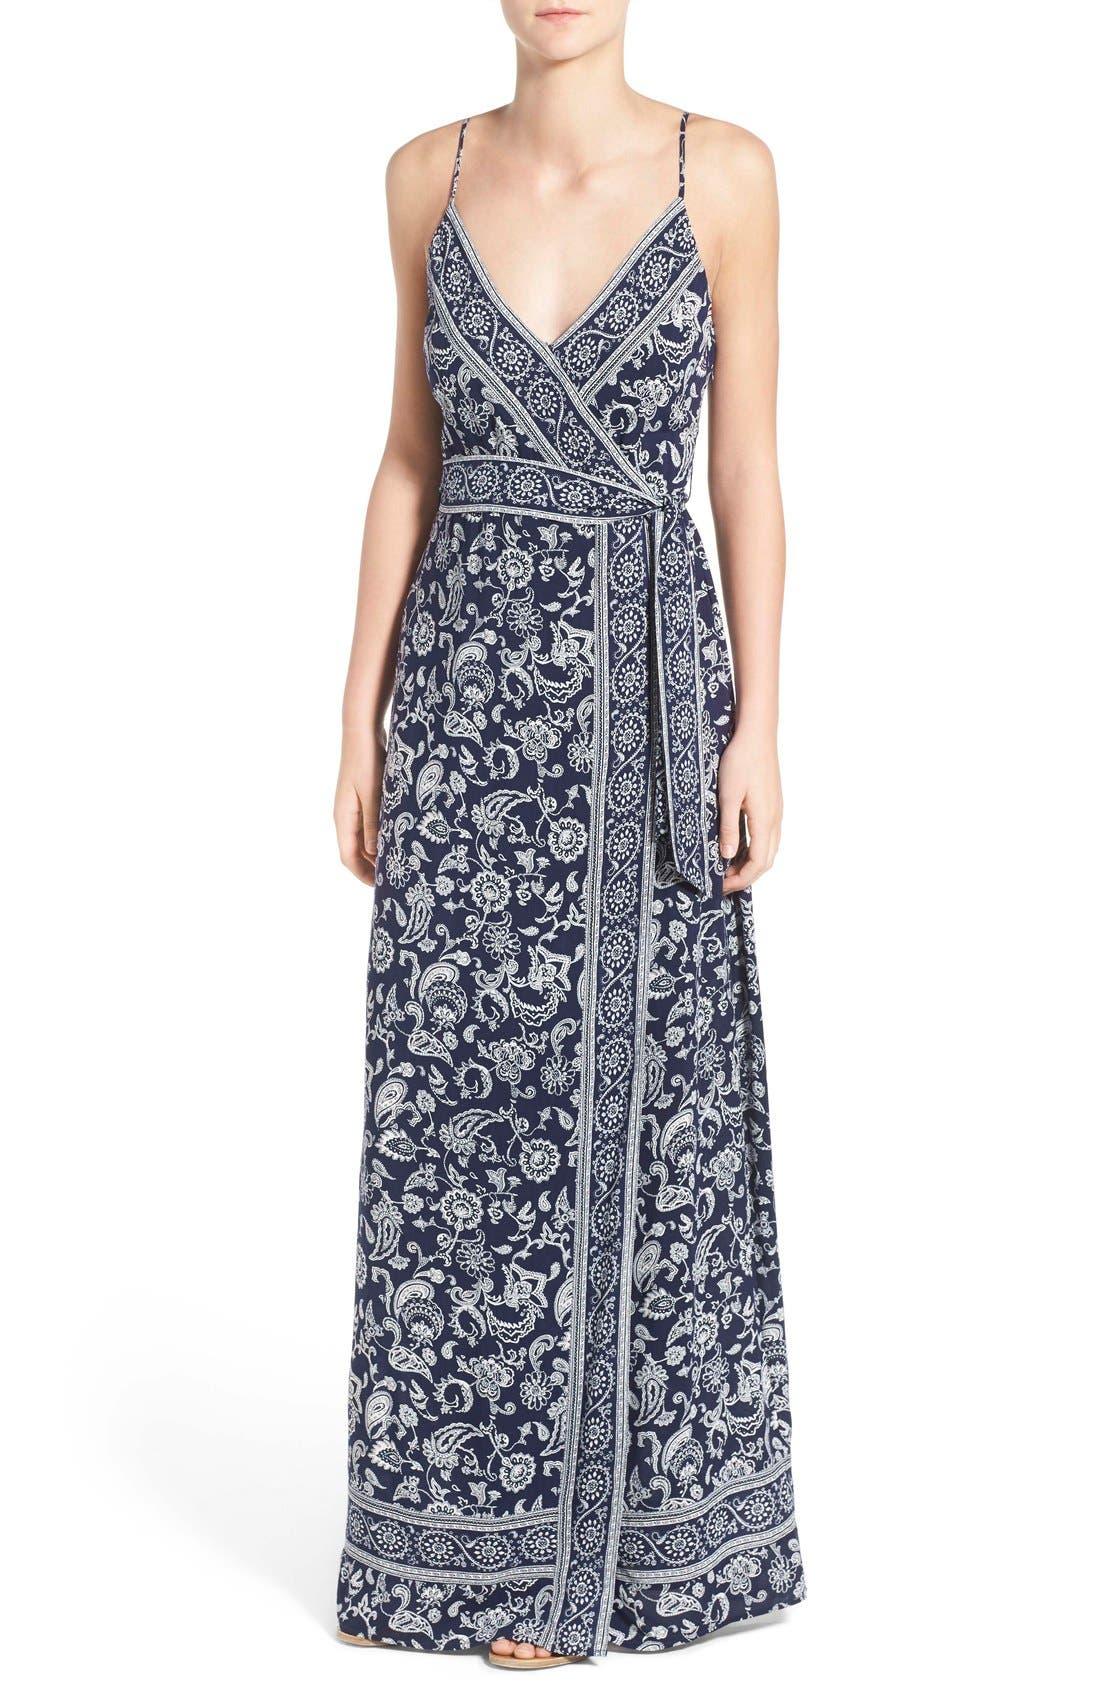 Main Image - PAIGE 'Regina' Print Maxi Surplice Dress